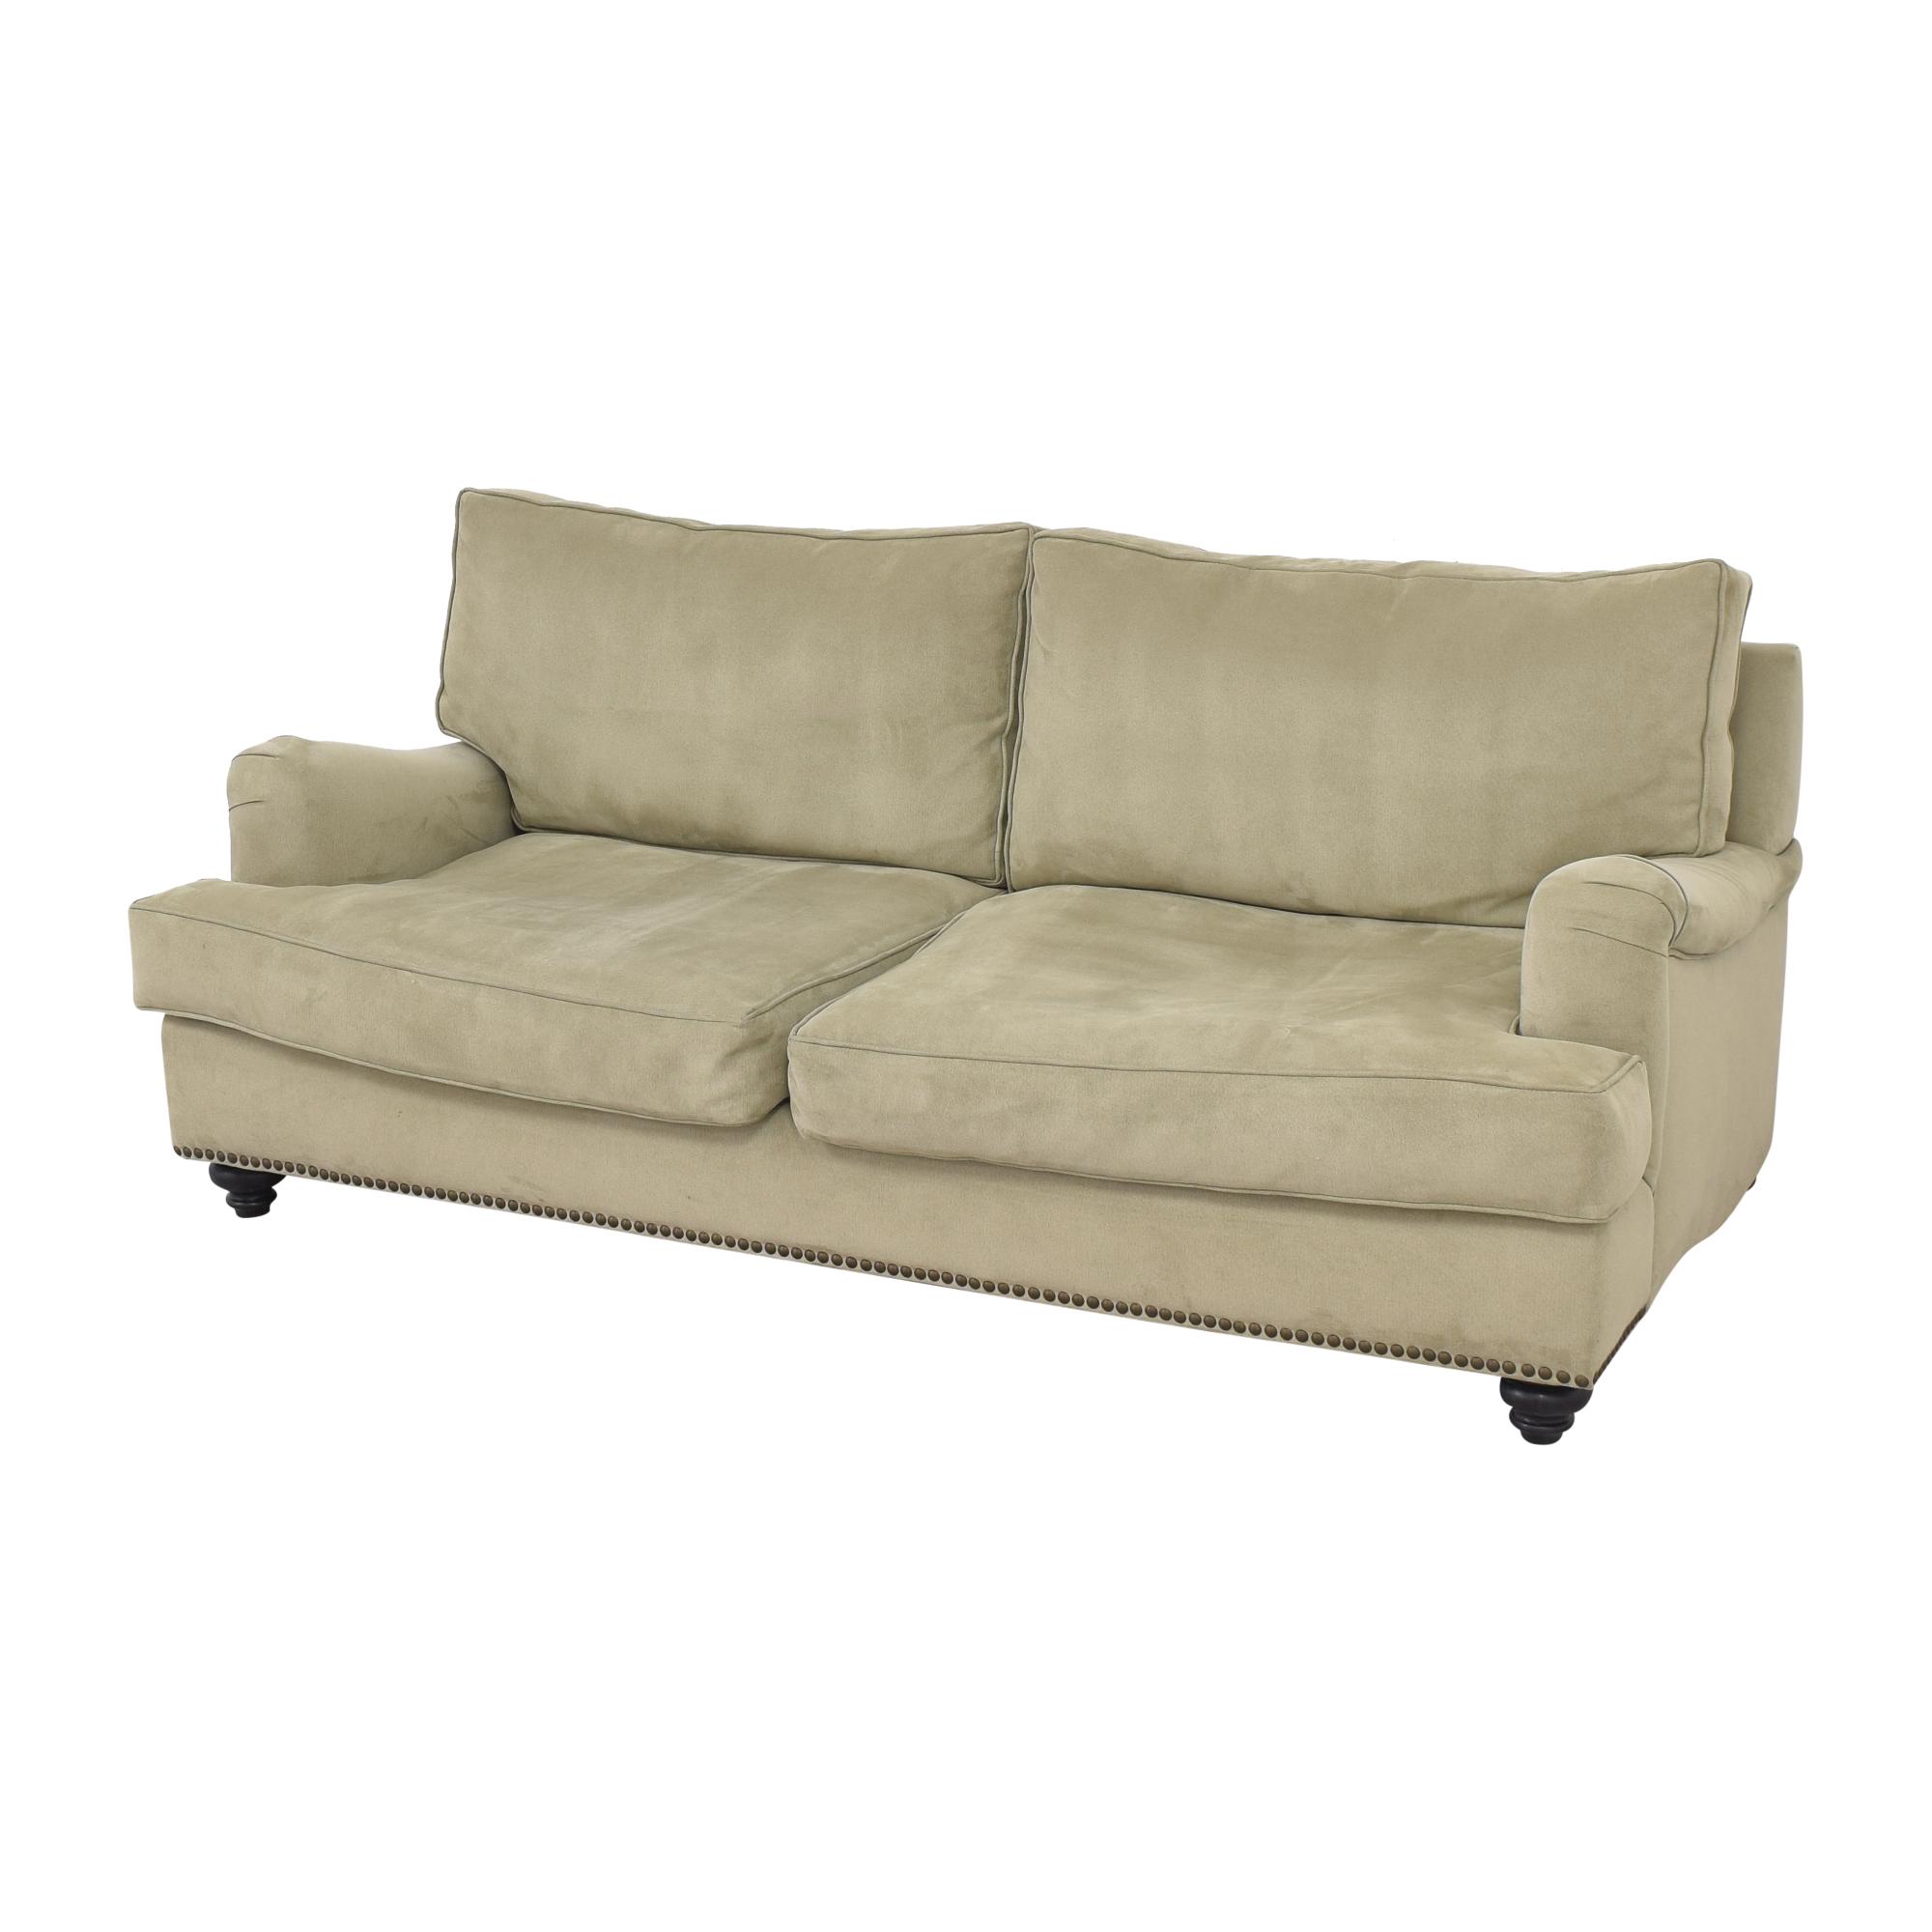 Custom Two Cushion Sofa sale